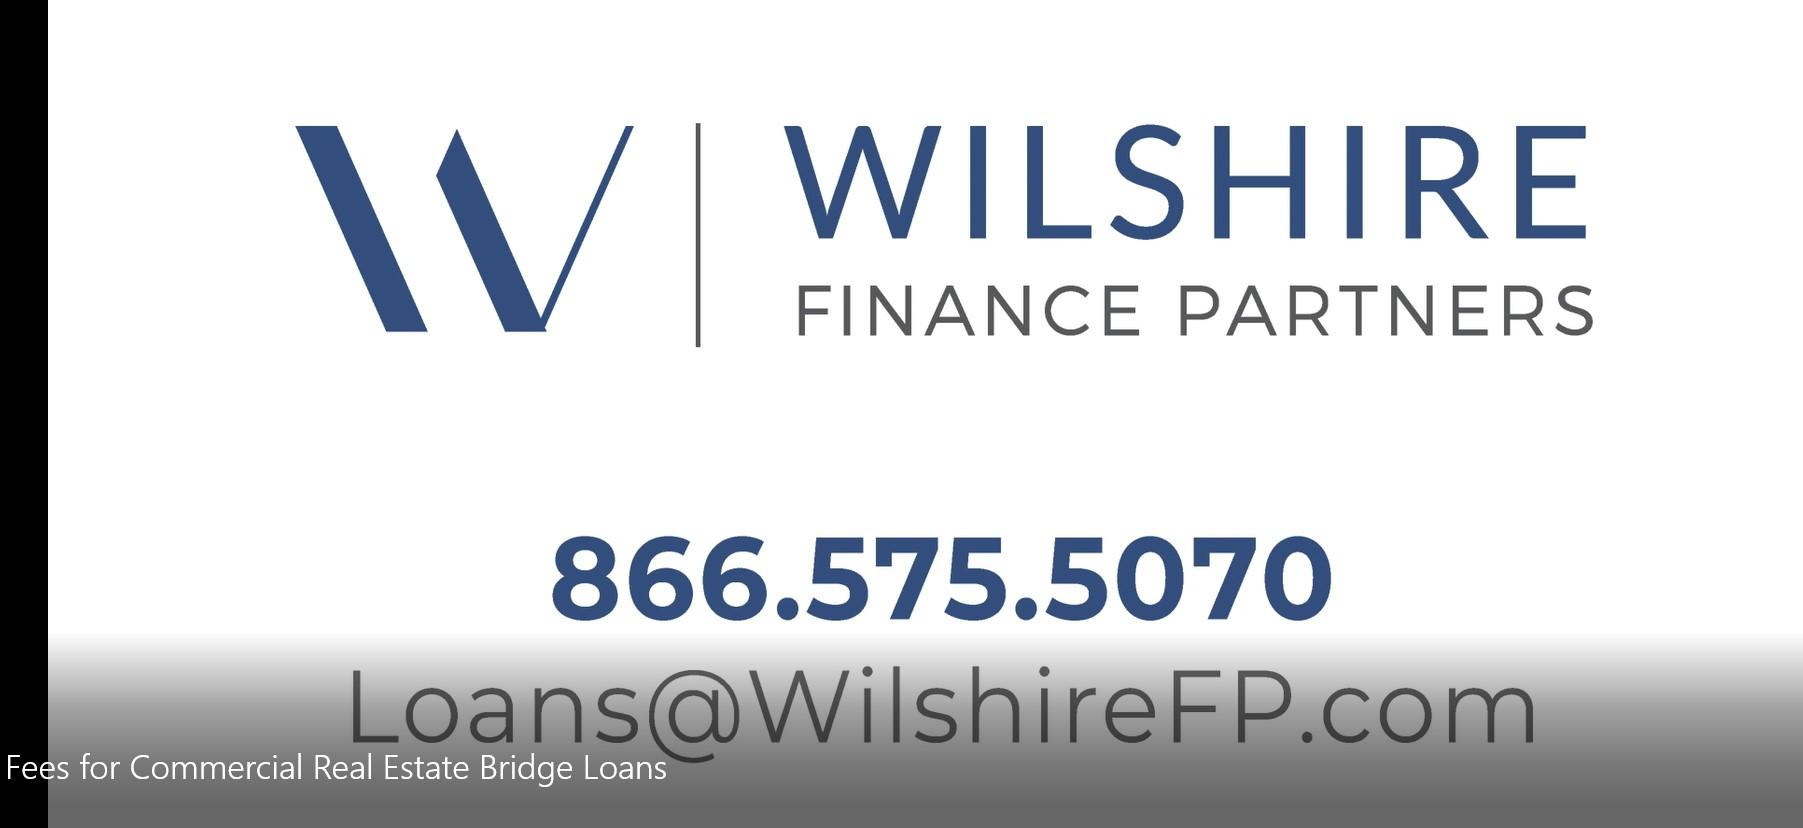 Fees for Commercial Real Estate Bridge Loans